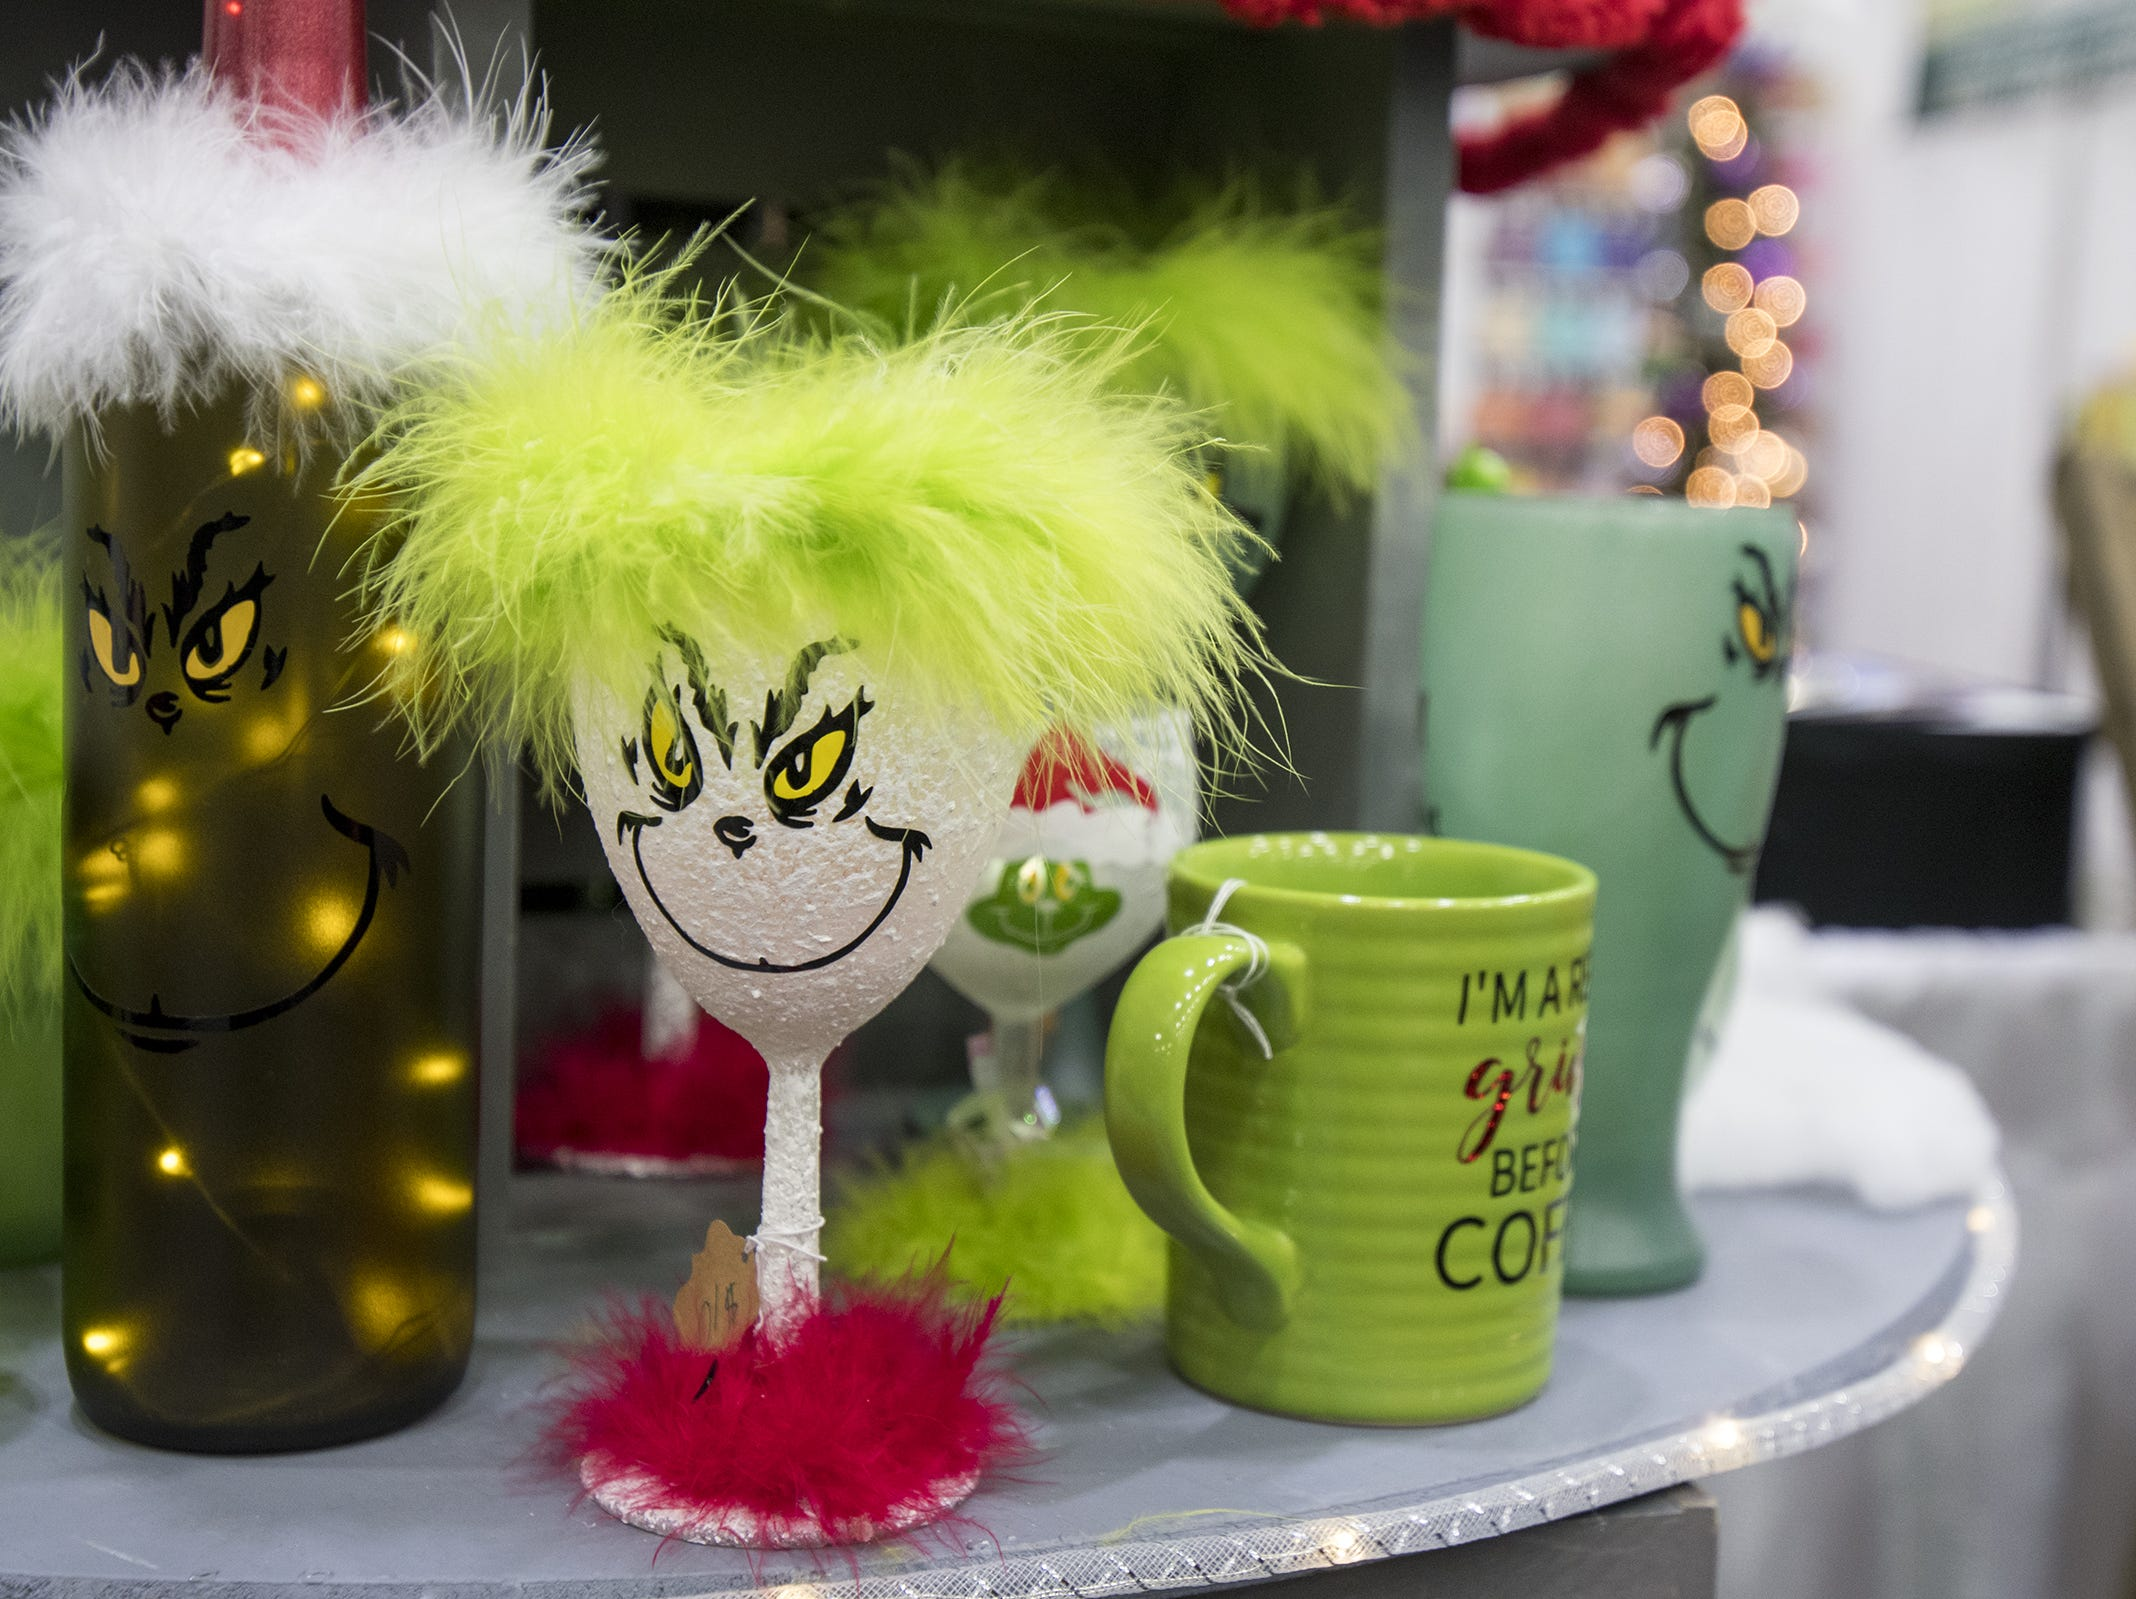 Kiri Creative Designs sells tons of Grinchy goods during the Greater Cincinnati Holiday Market at the Duke Energy Center Friday, November 2, 2018 in Cincinnati, Ohio.